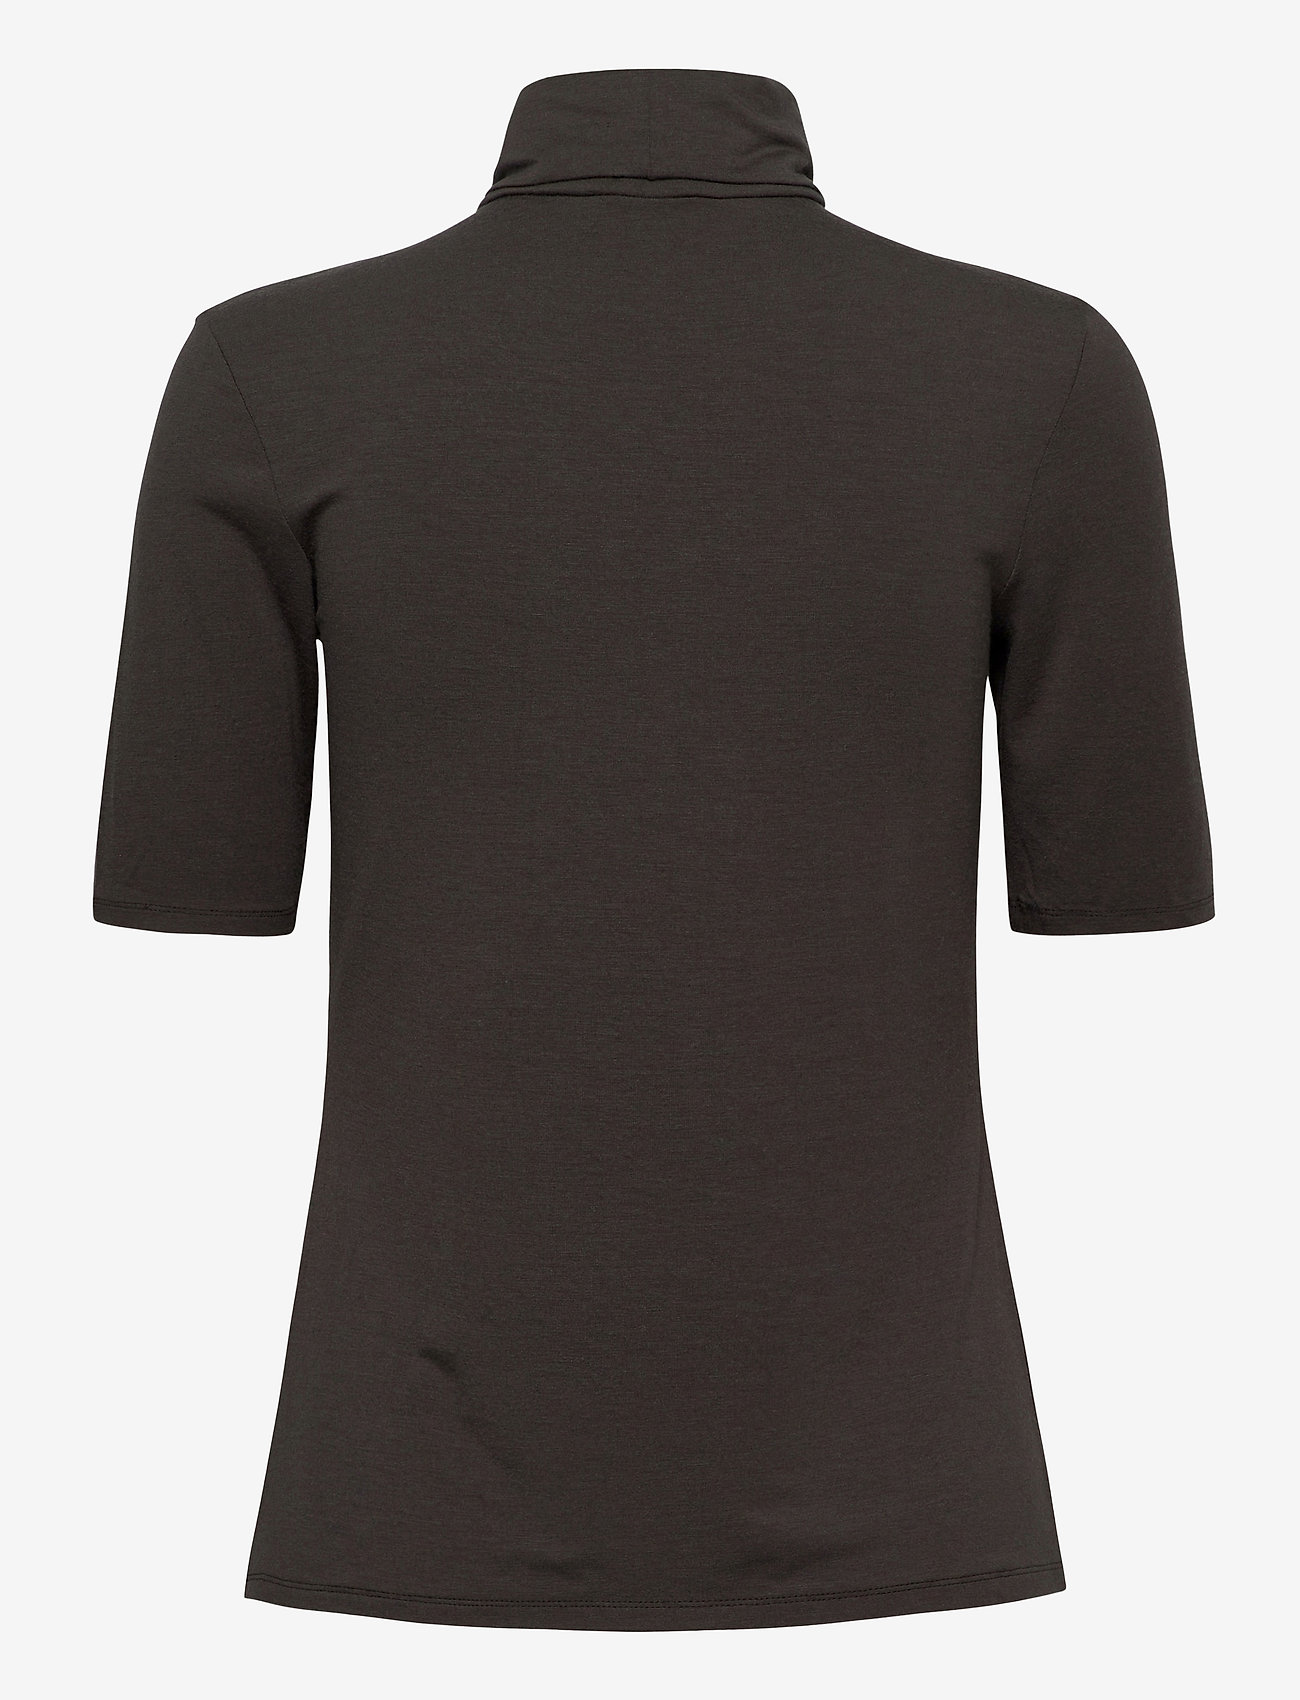 Esprit Collection - T-Shirts - t-shirts - gunmetal 5 - 1